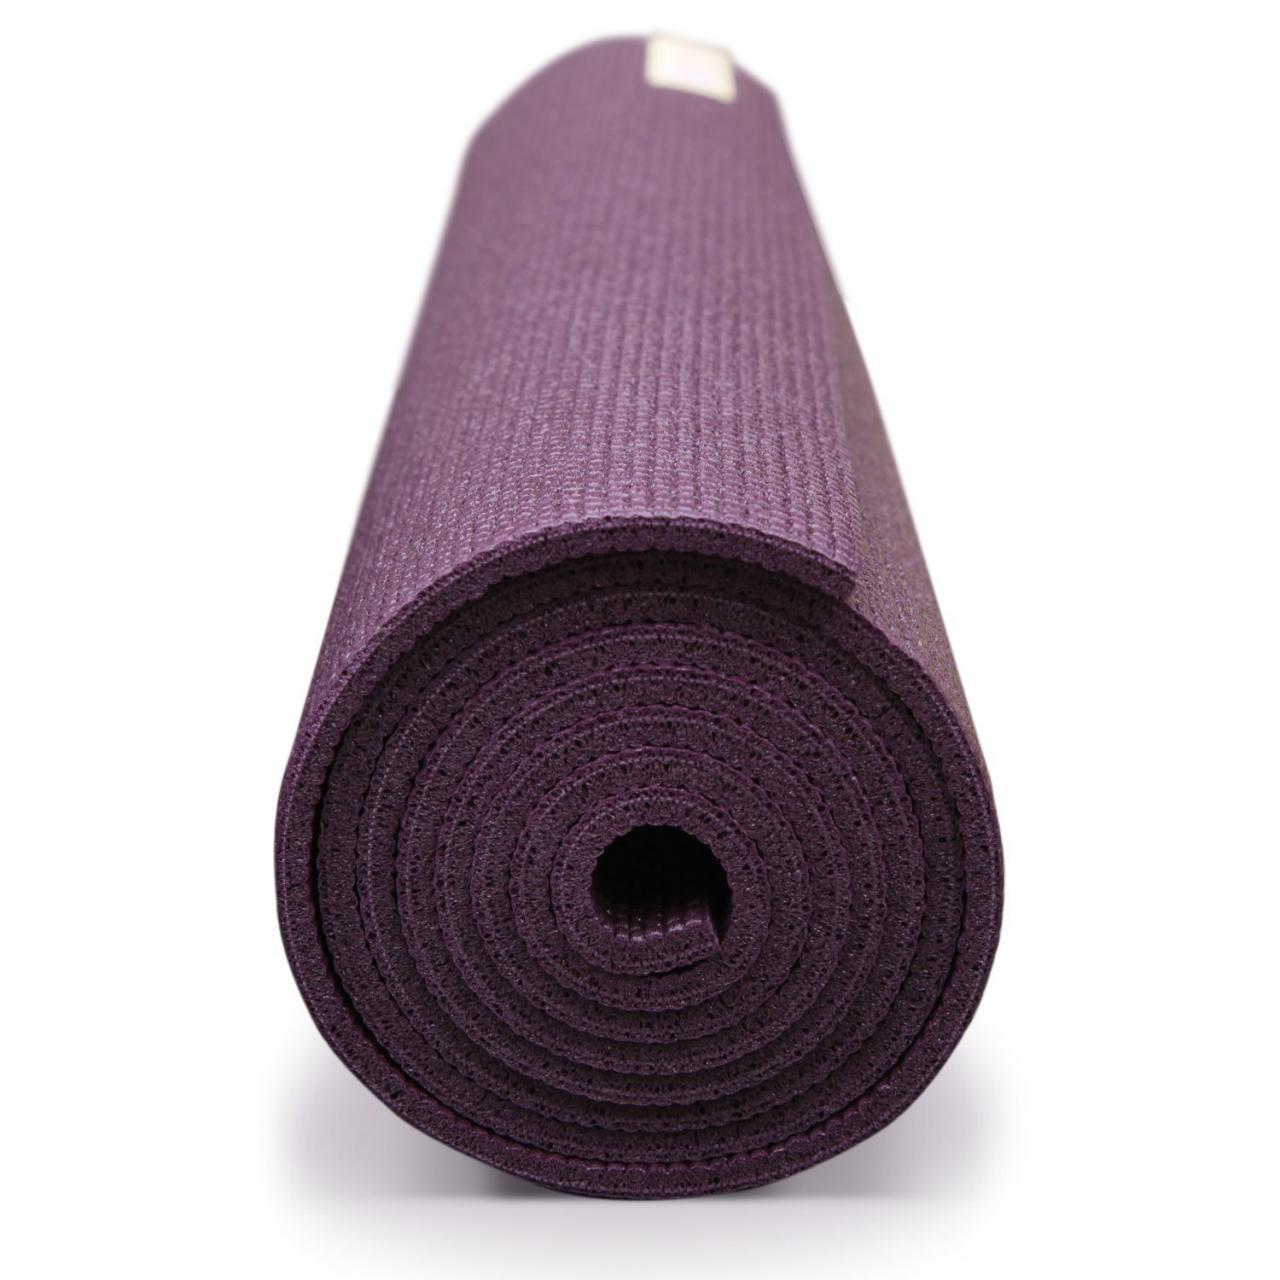 Top 10 Best Yoga Mats